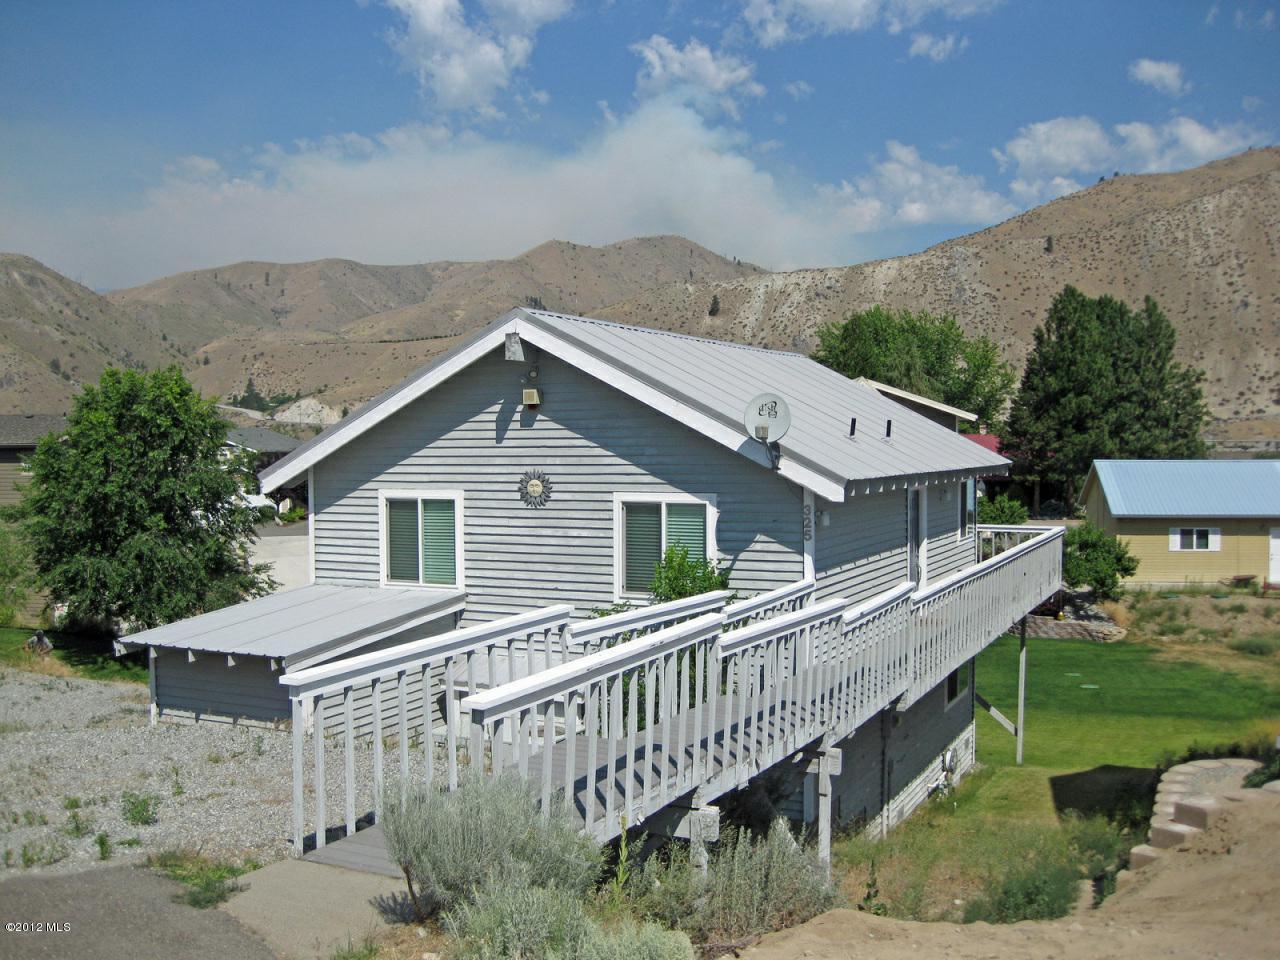 325 W Beach Drive, Orondo, WA 98843 (MLS #698808) :: Nick McLean Real Estate Group